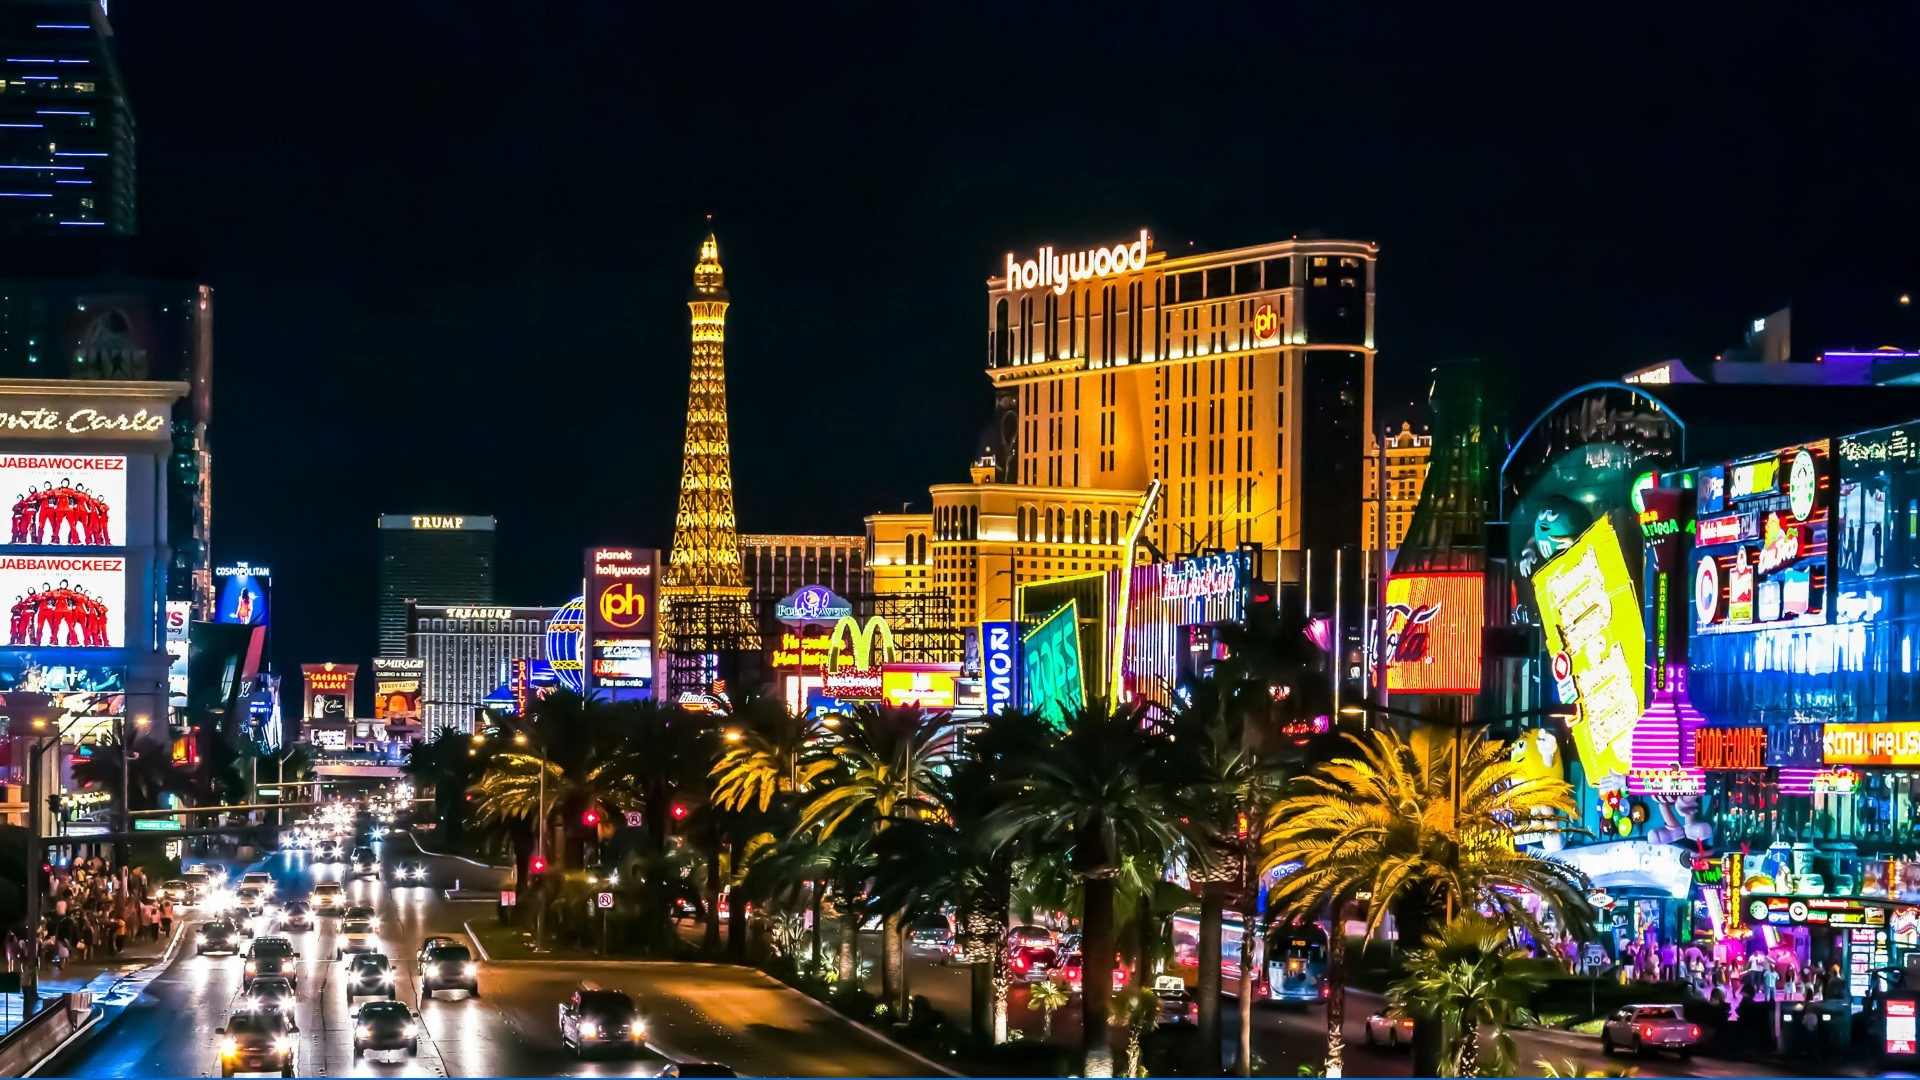 Las Vegas Wallpaper 68 images 1920x1080